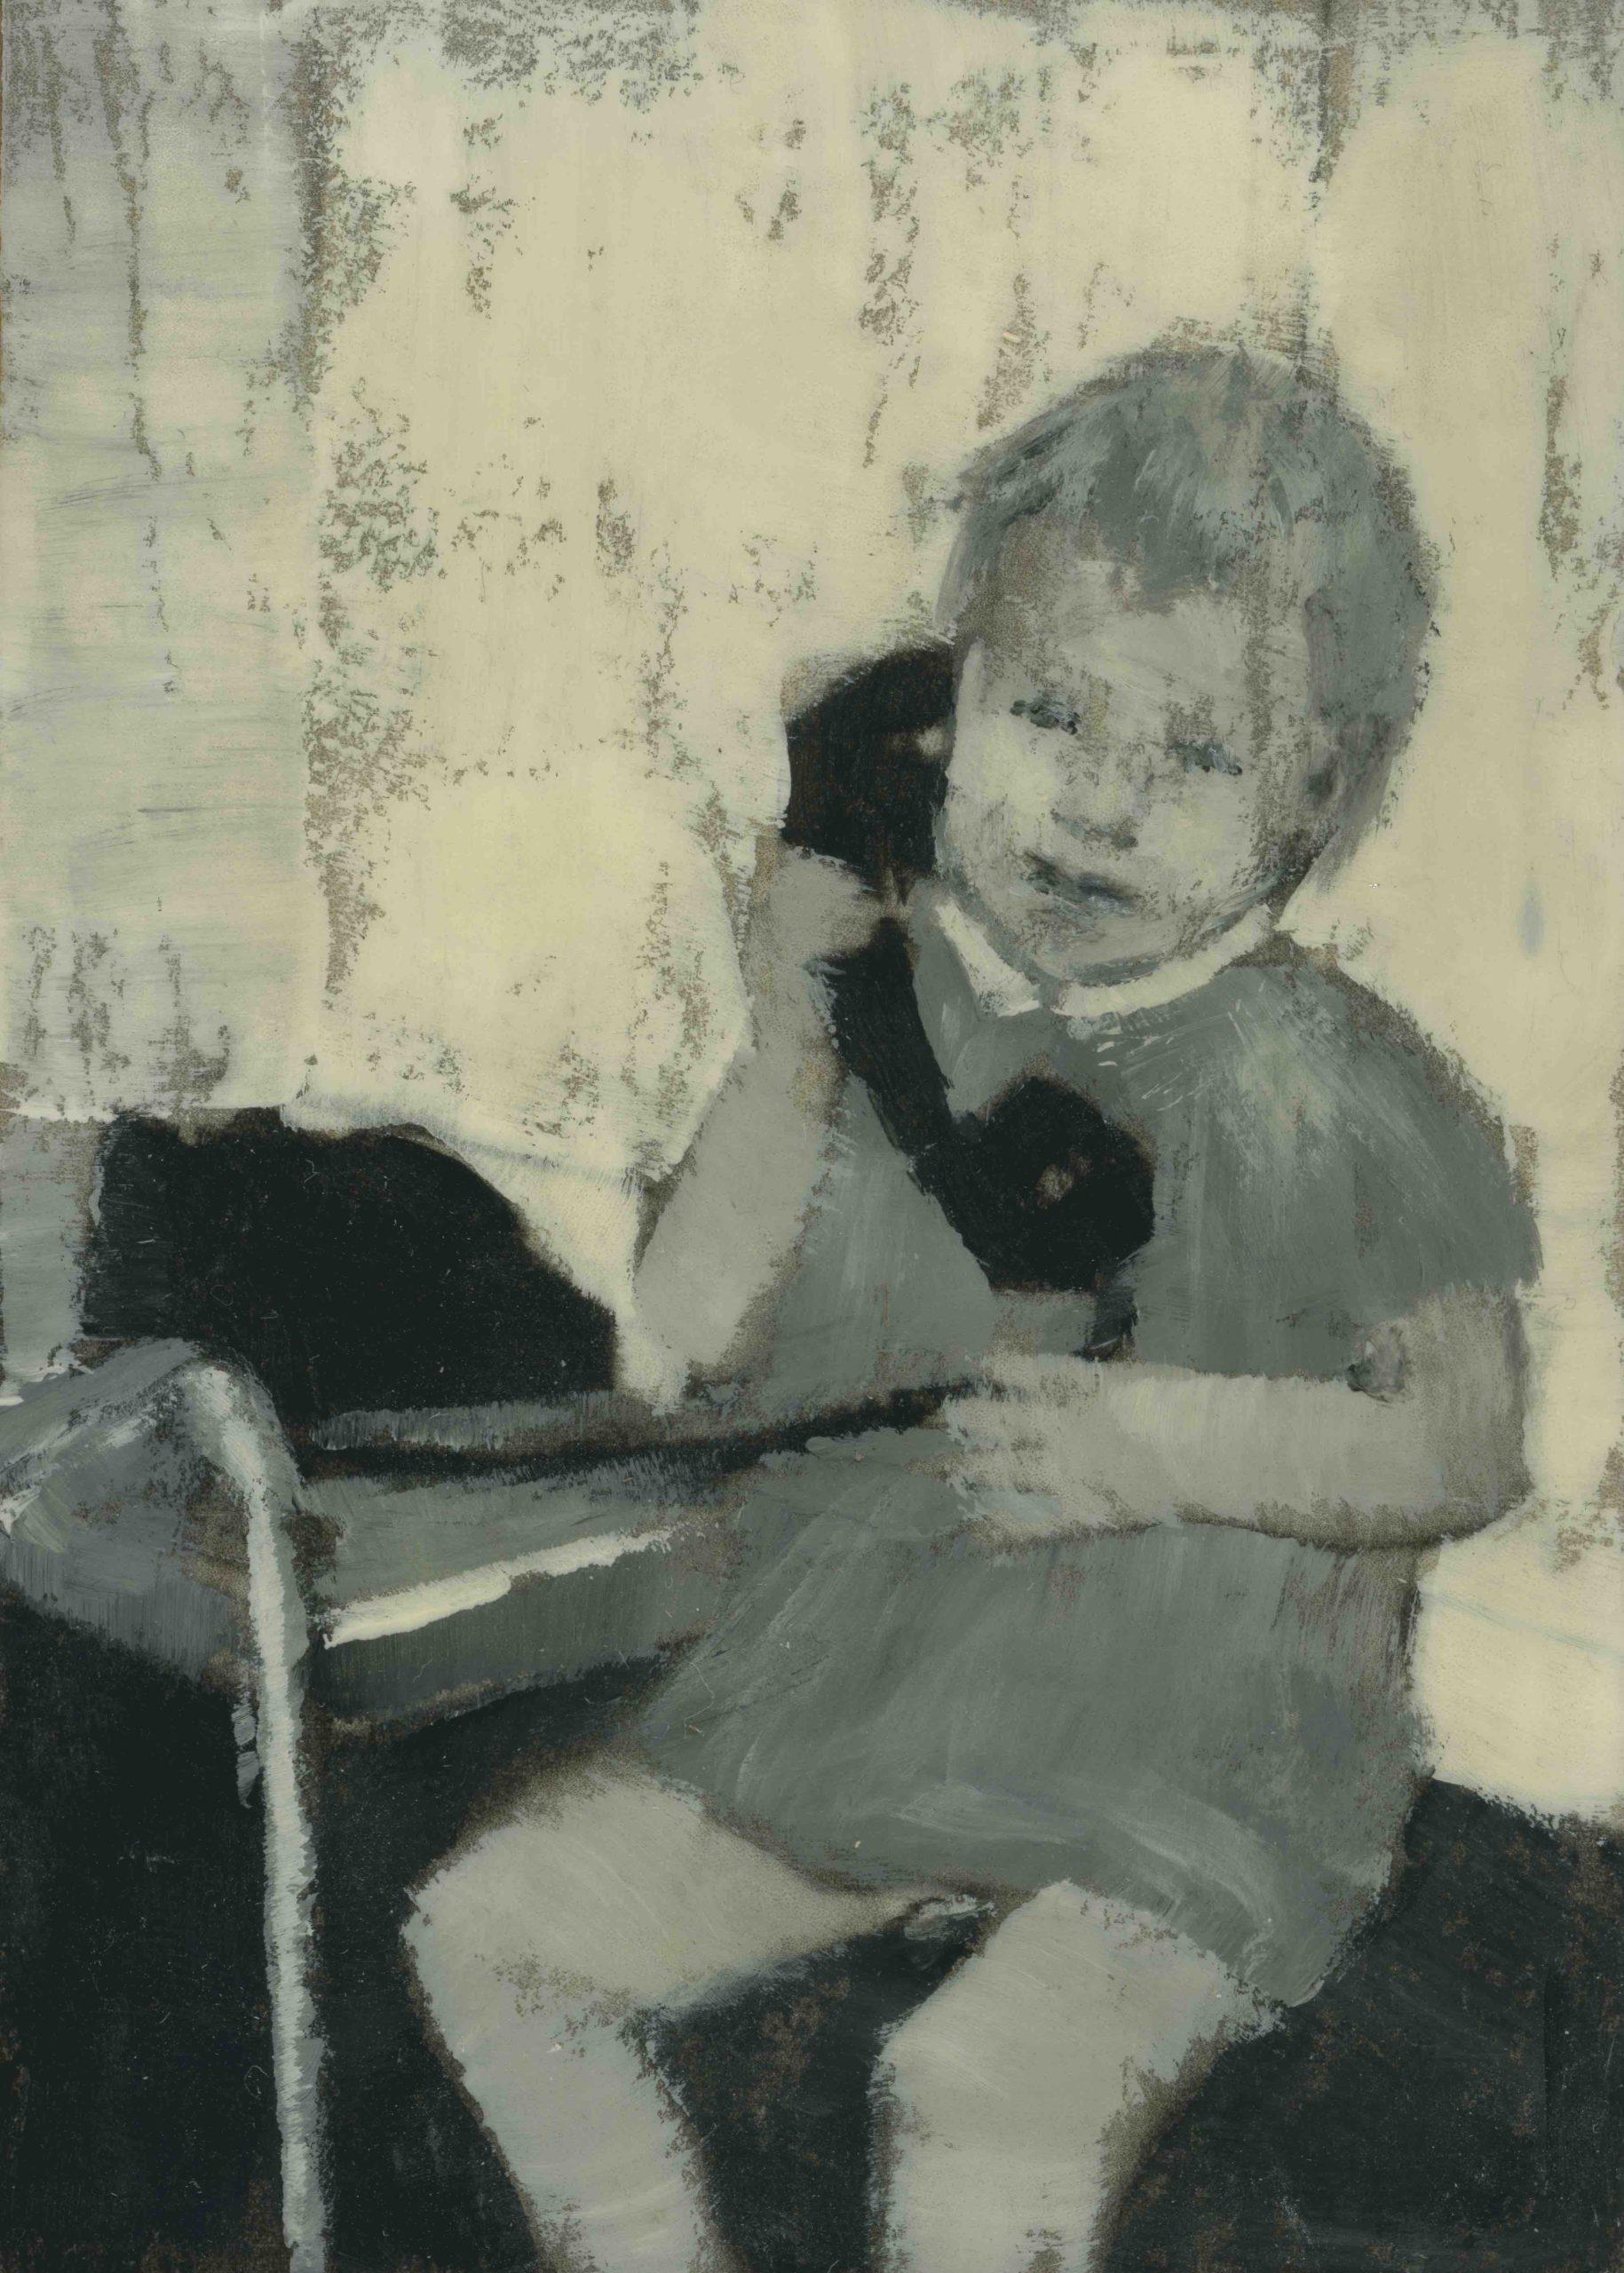 kunstwerk meisje met telefoon